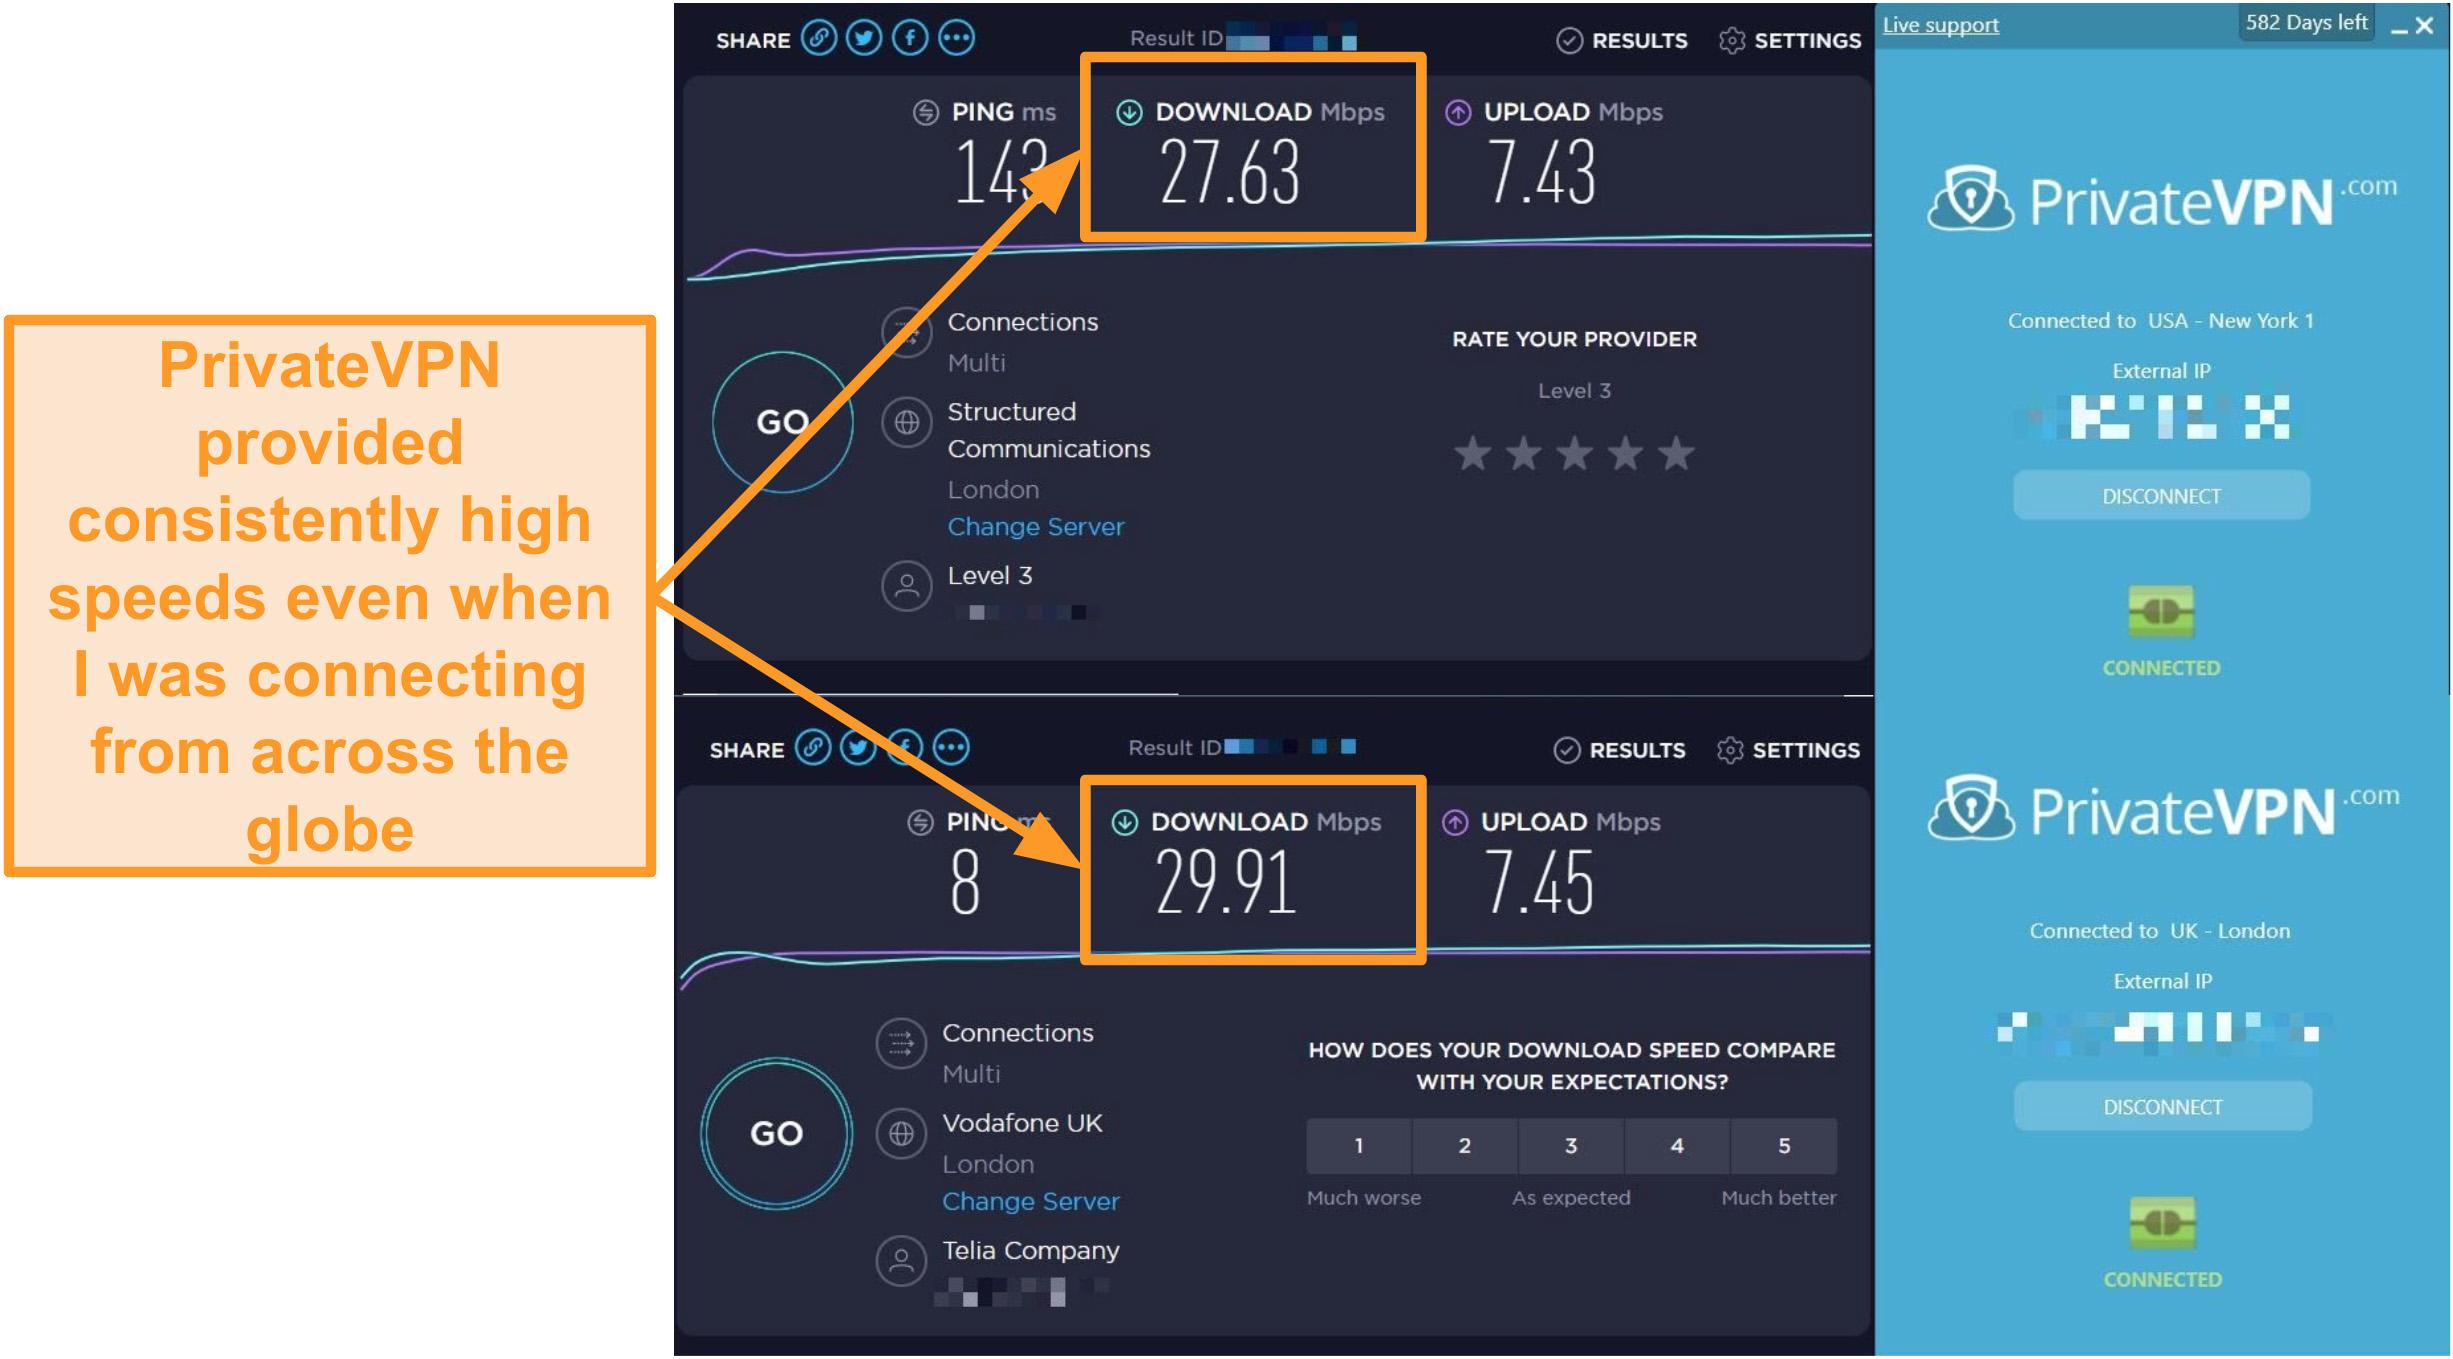 Screenshot of PrivateVPN speed comparison